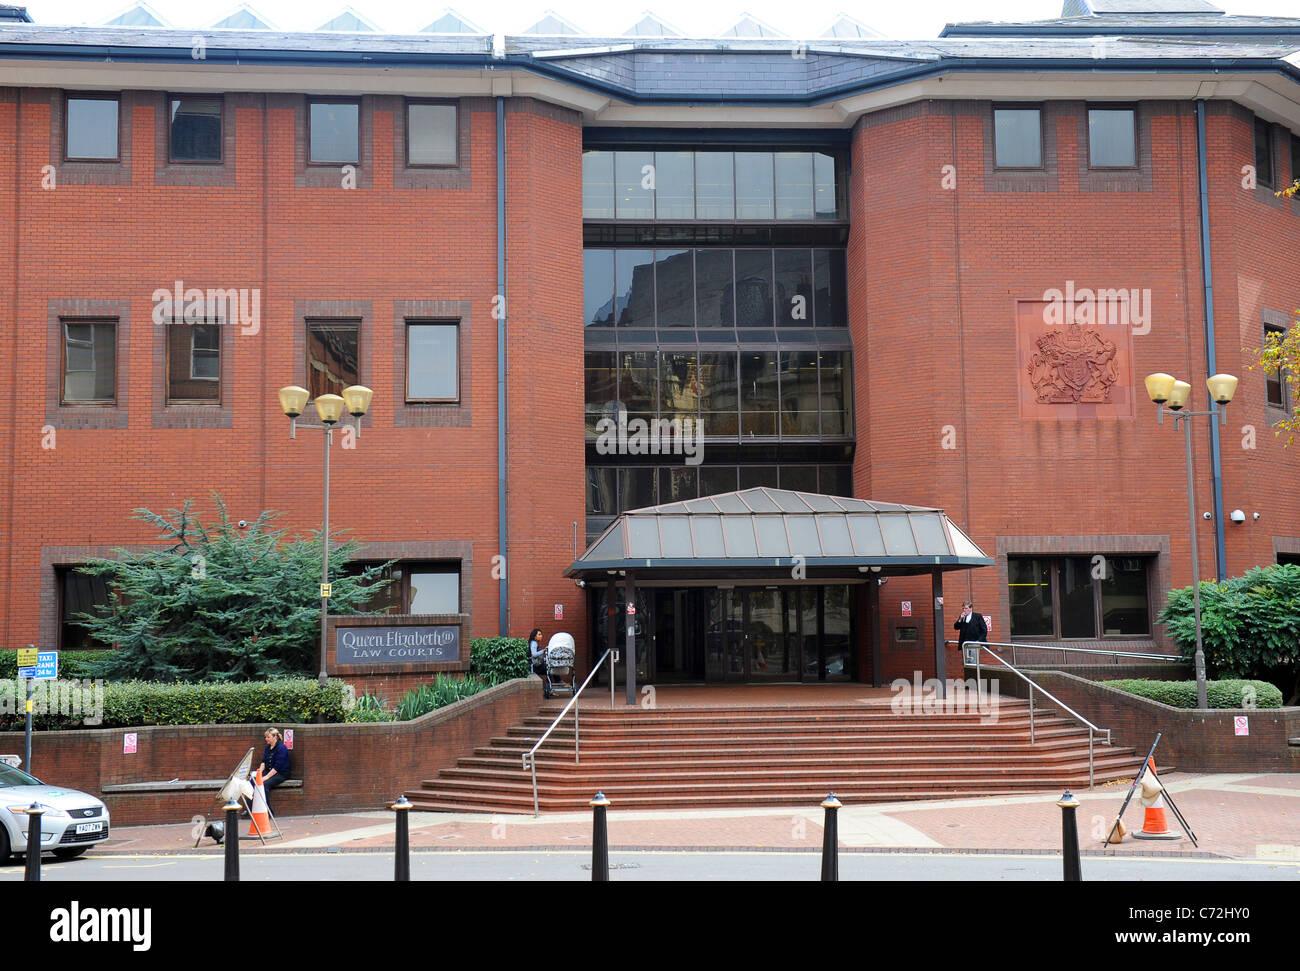 Birmingham Crown Court building England West Midlands Uk - Stock Image